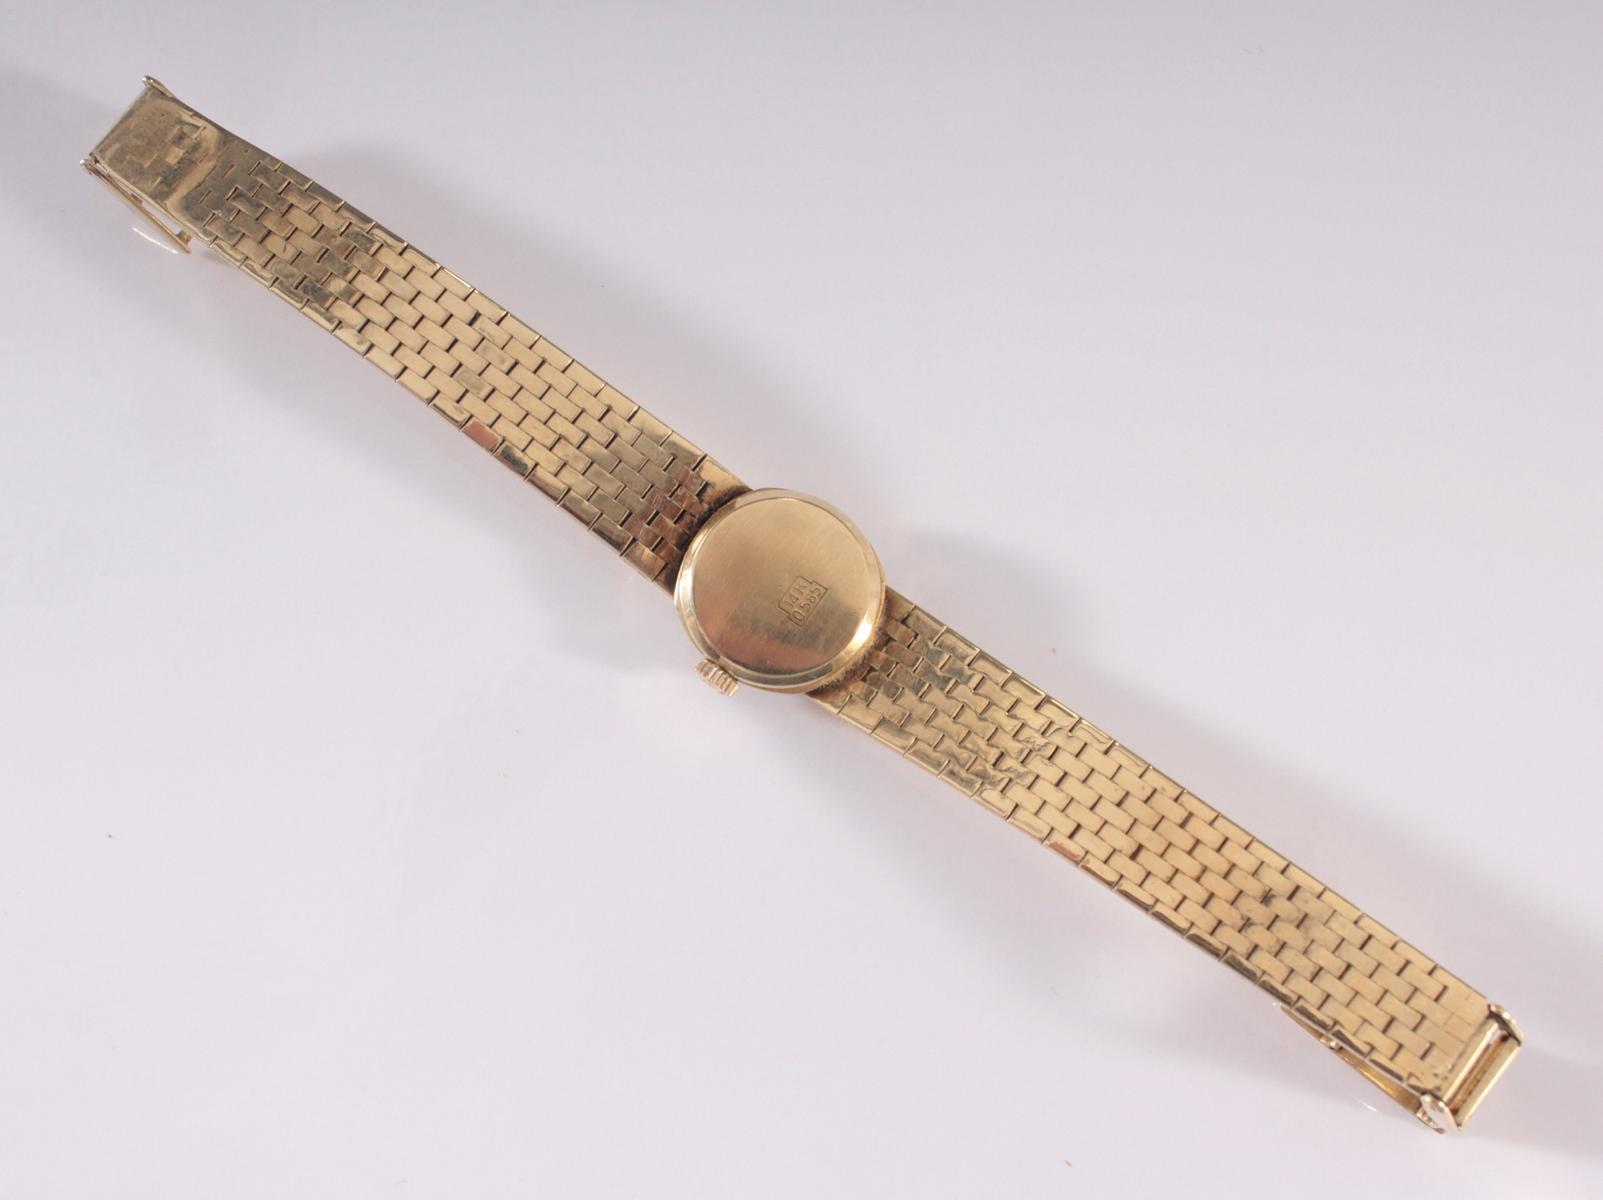 Damenarmbanduhr der Marke Drafa aus 14 Karat Gelbgold-3